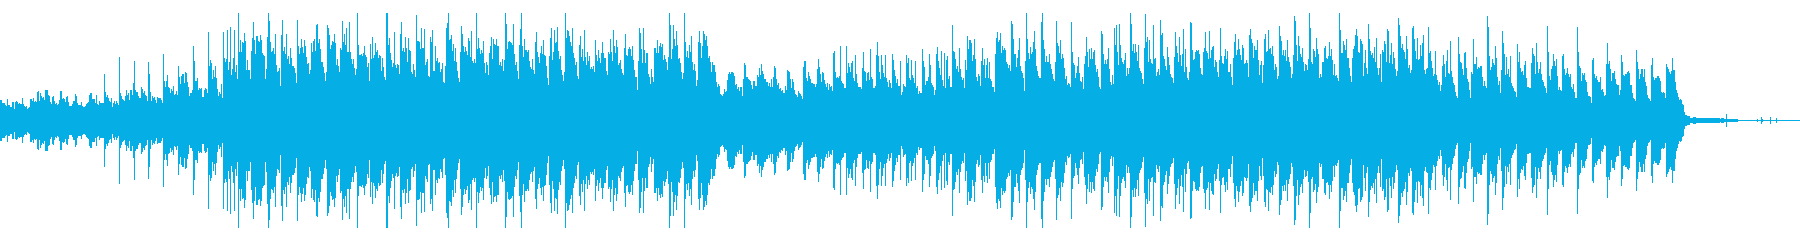 Chillっぽく落ち着いたBGMの再生済みの波形